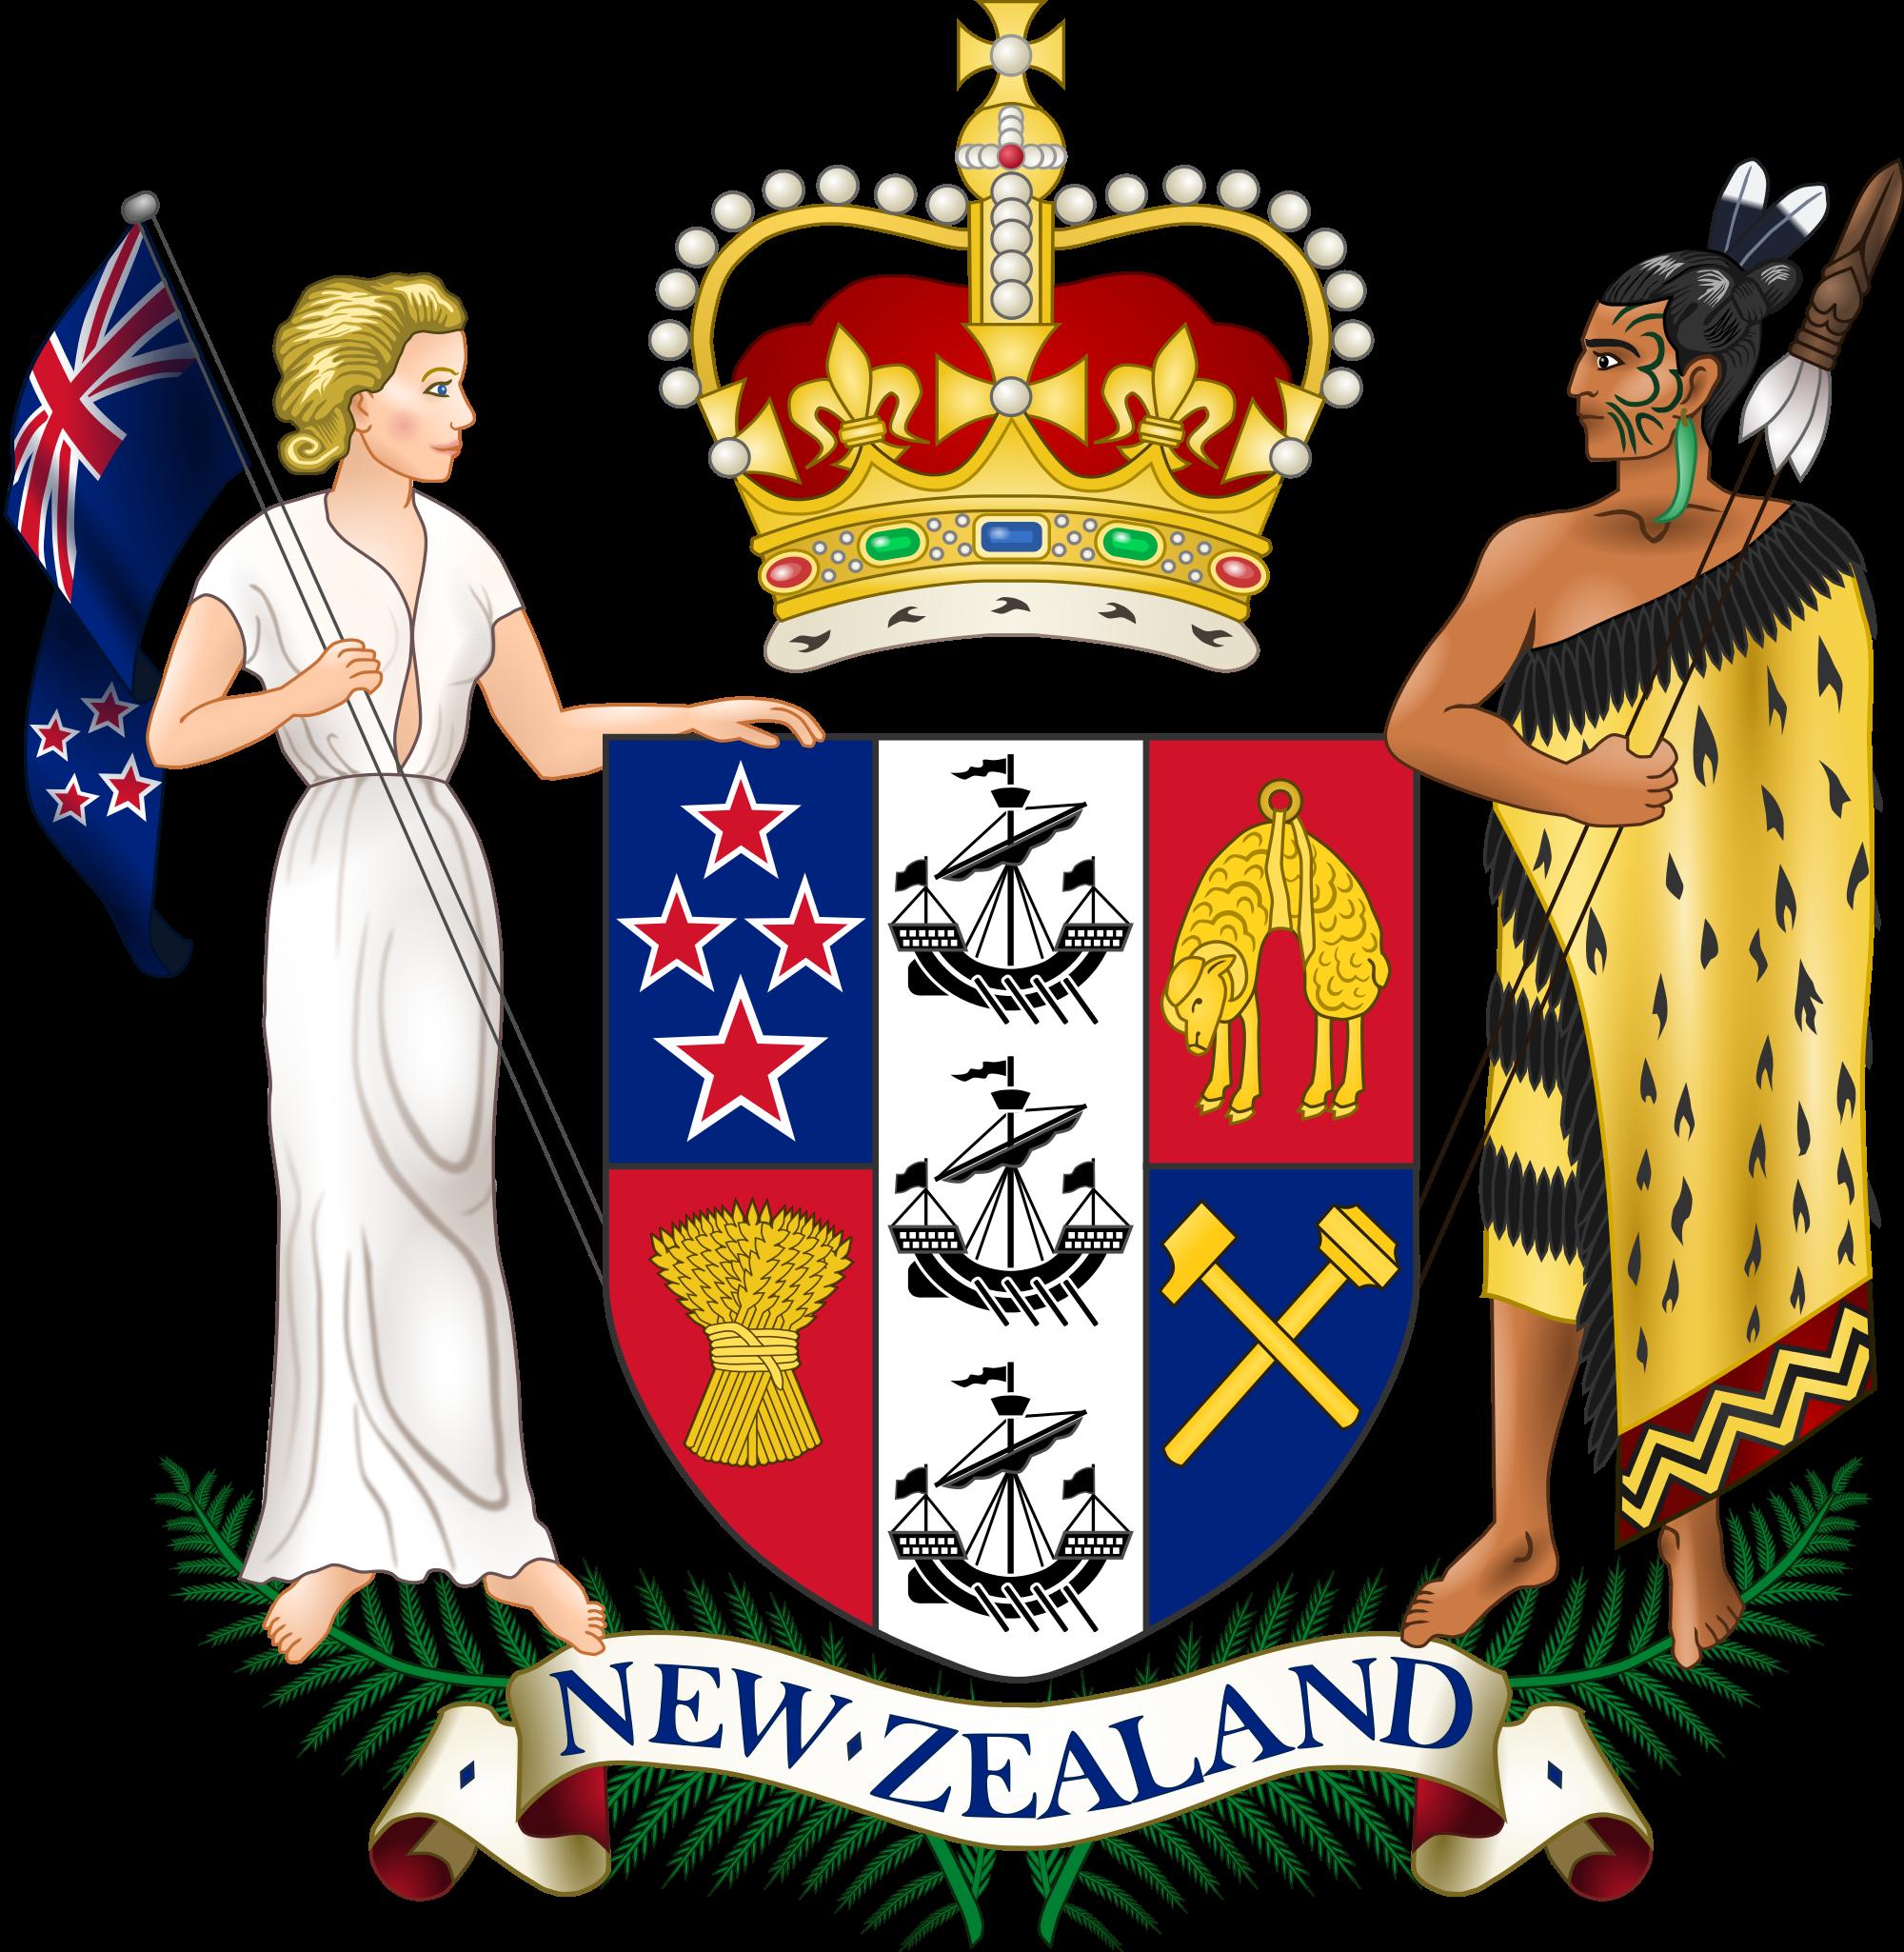 Uuden-Seelannin vaakuna